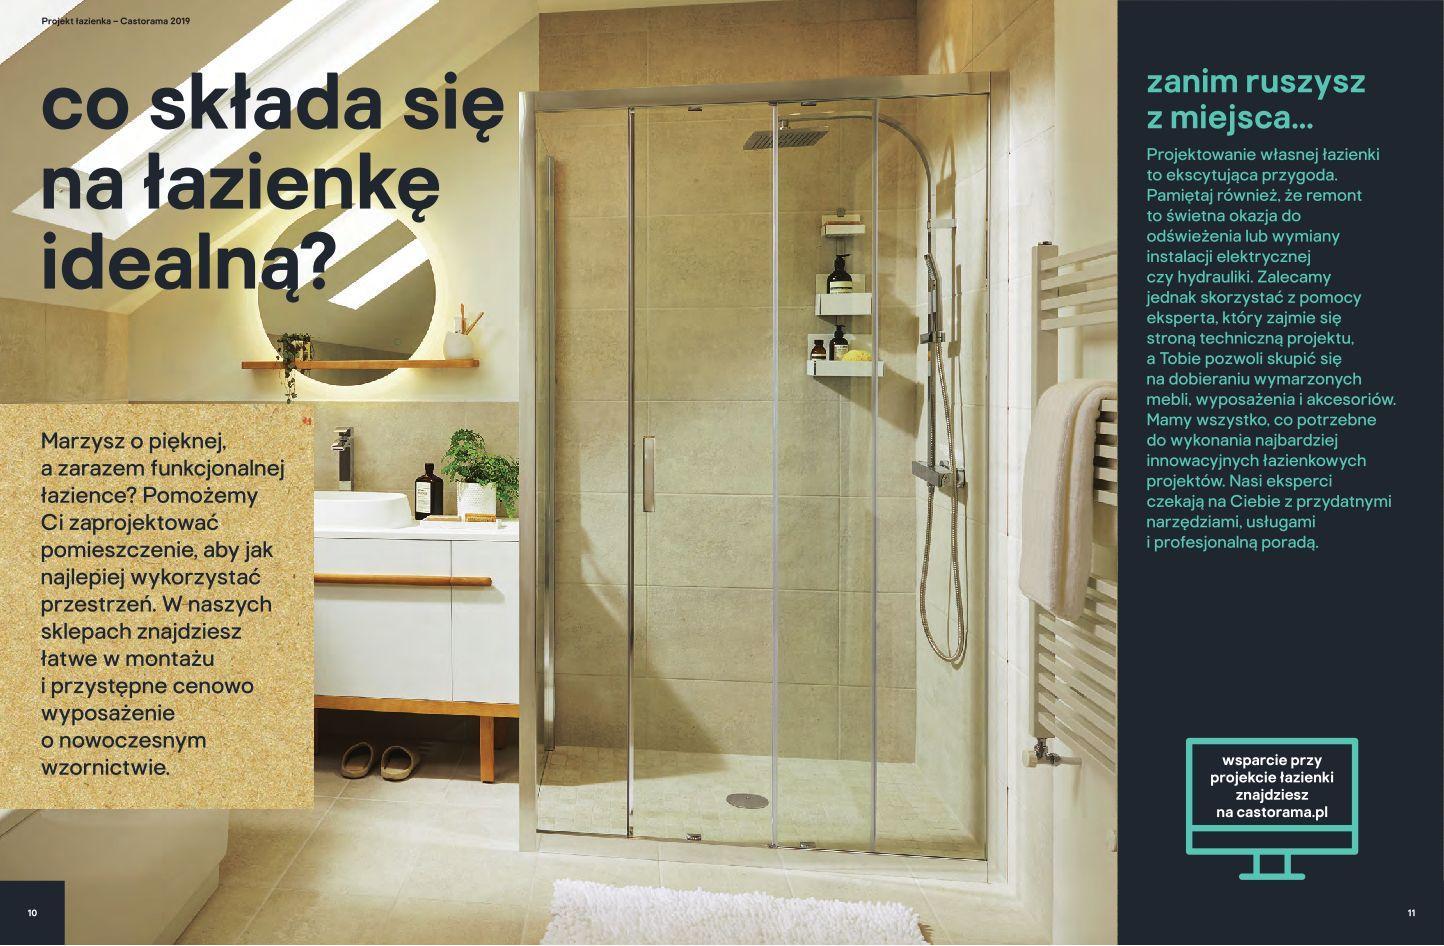 Gazetka promocyjna Castorama do 31/12/2019 str.6